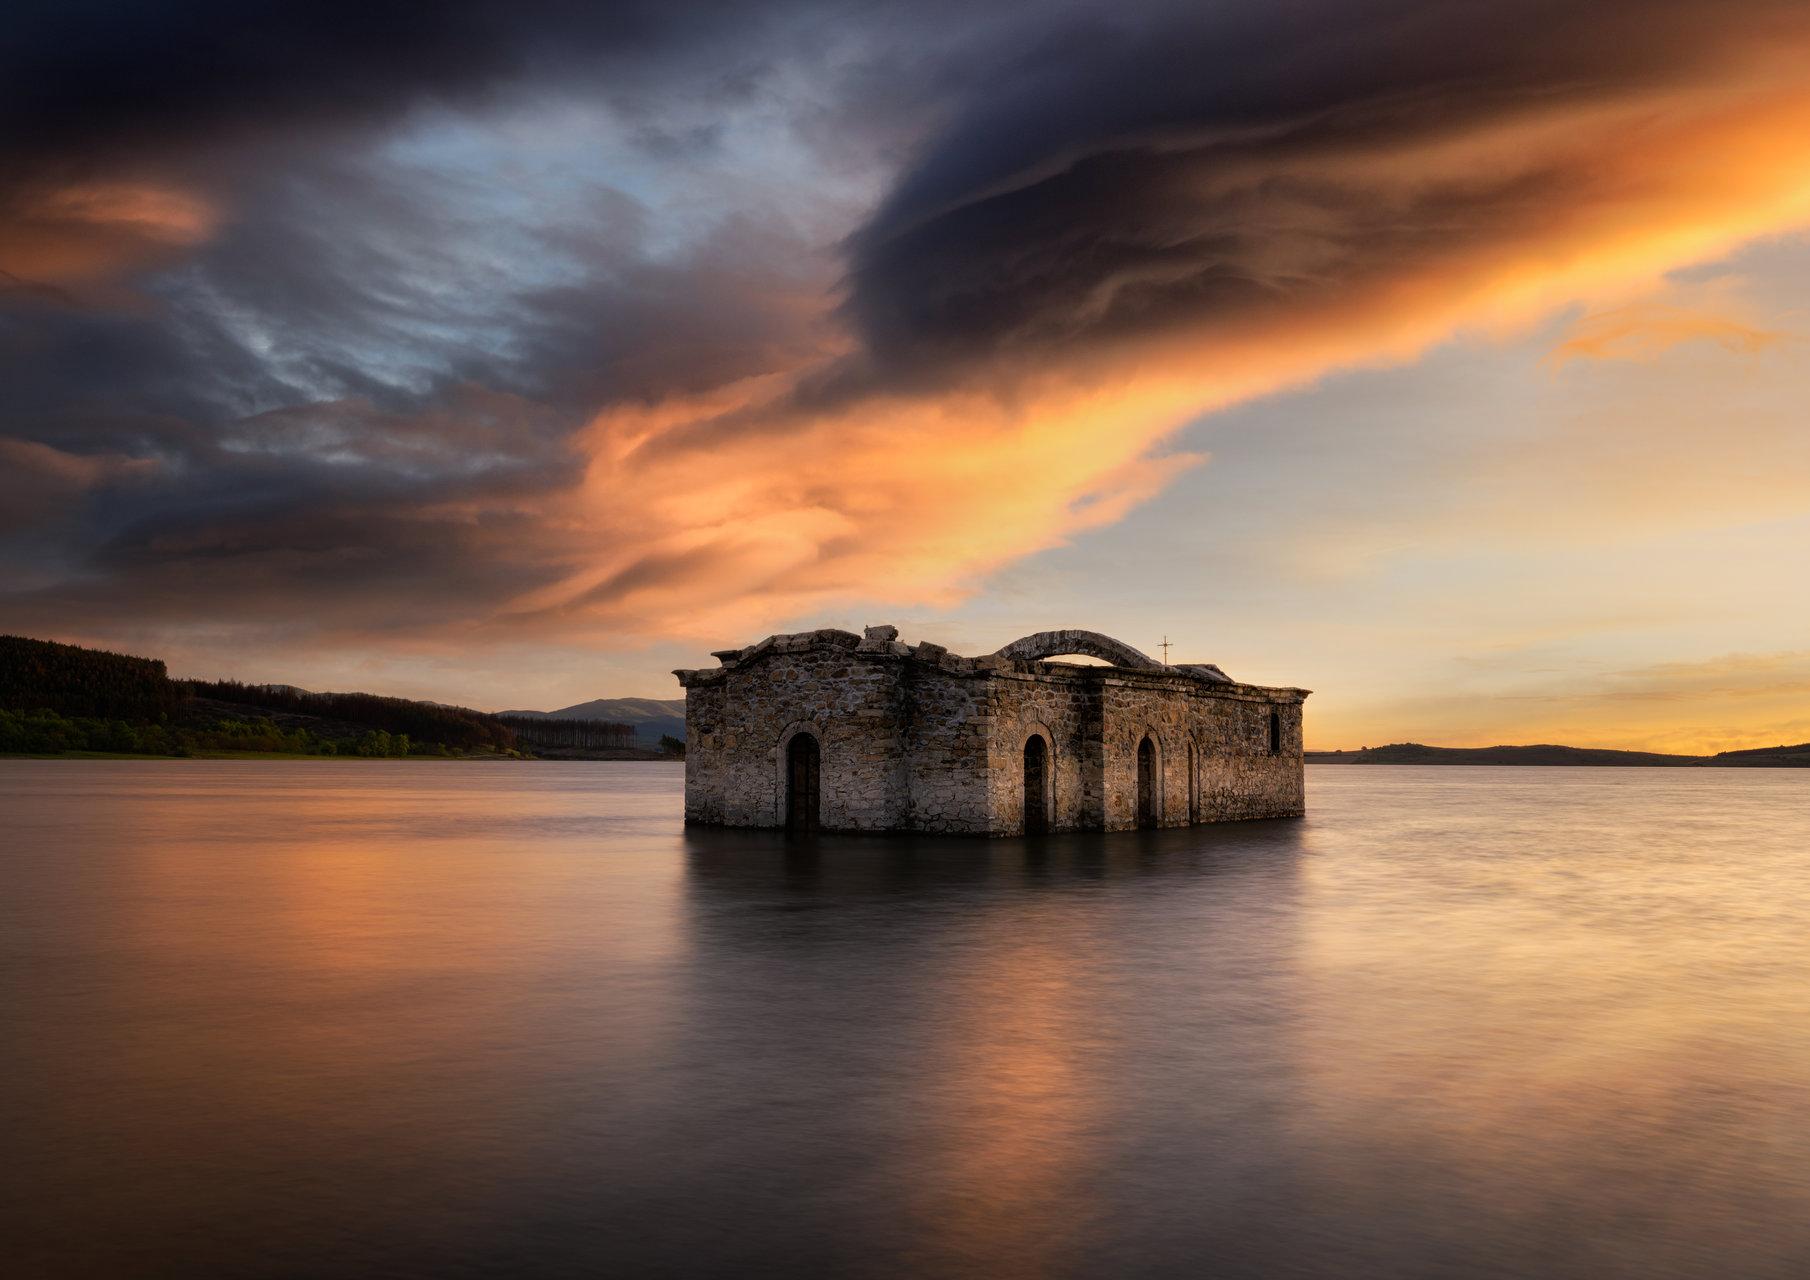 Потопената църква | Author Boyko Valchev - boiko90 | PHOTO FORUM